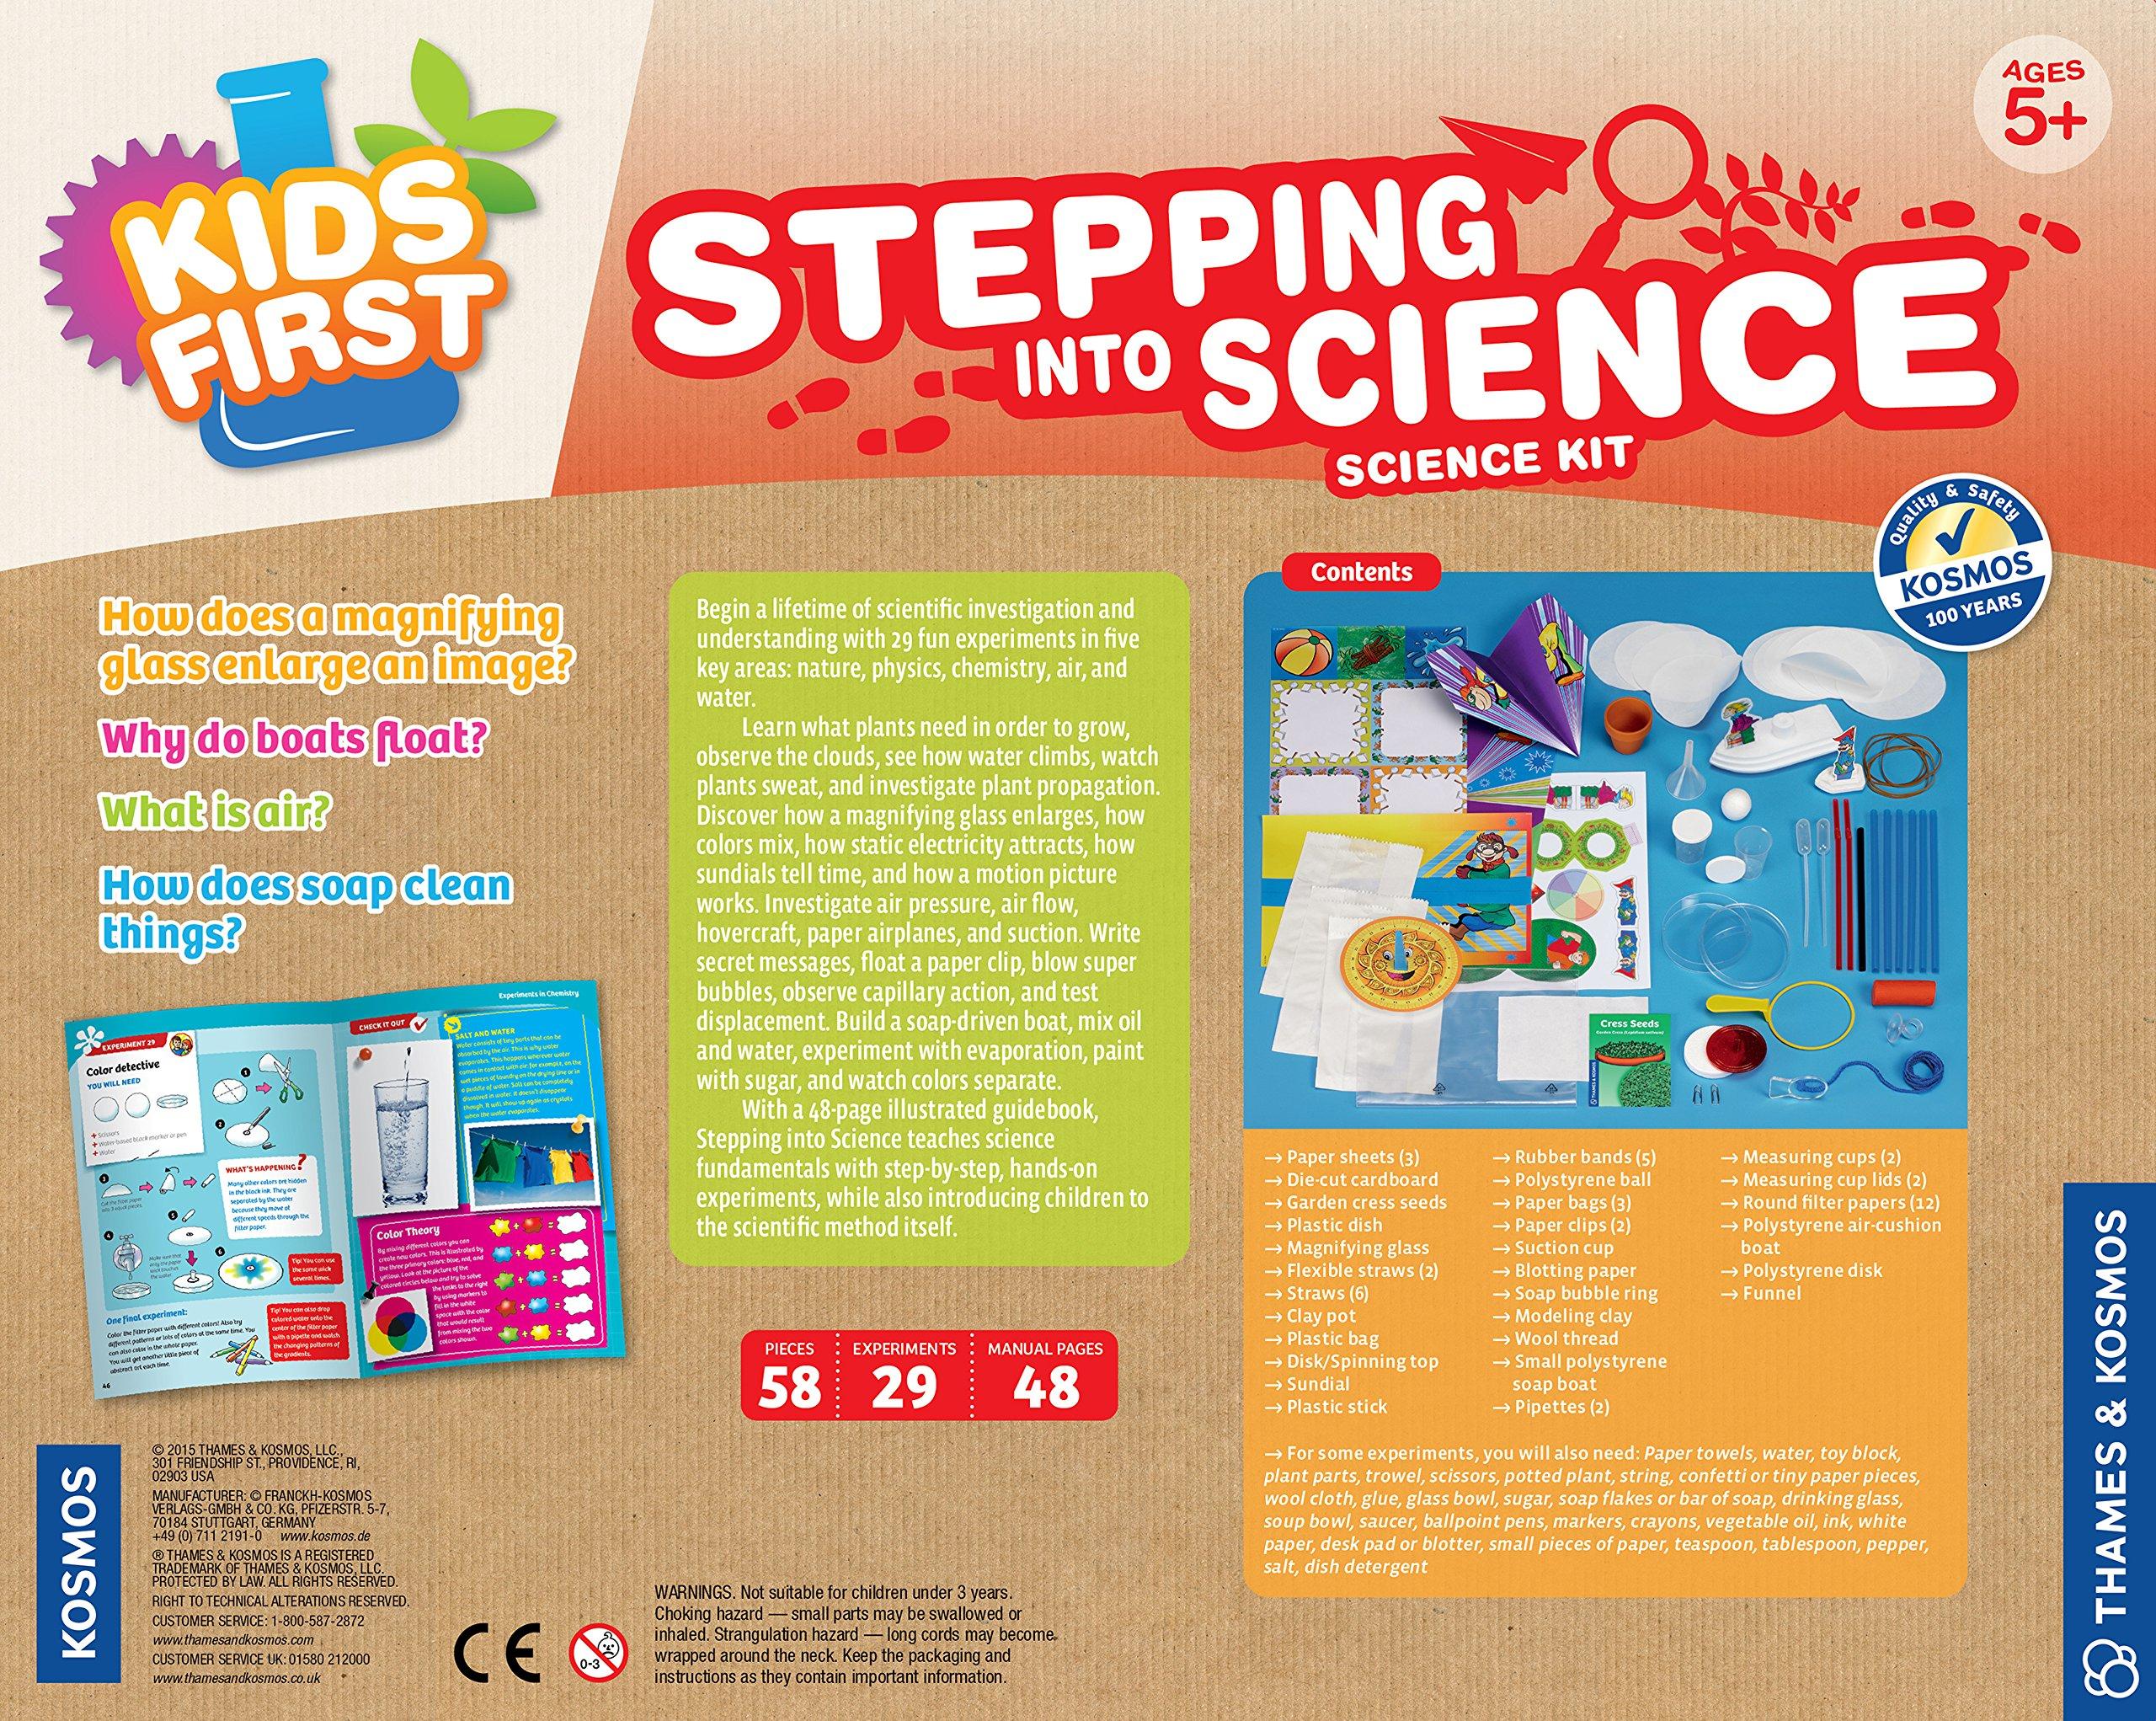 Thames & Kosmos Various Stepping into Science Kit by Thames & Kosmos (Image #1)